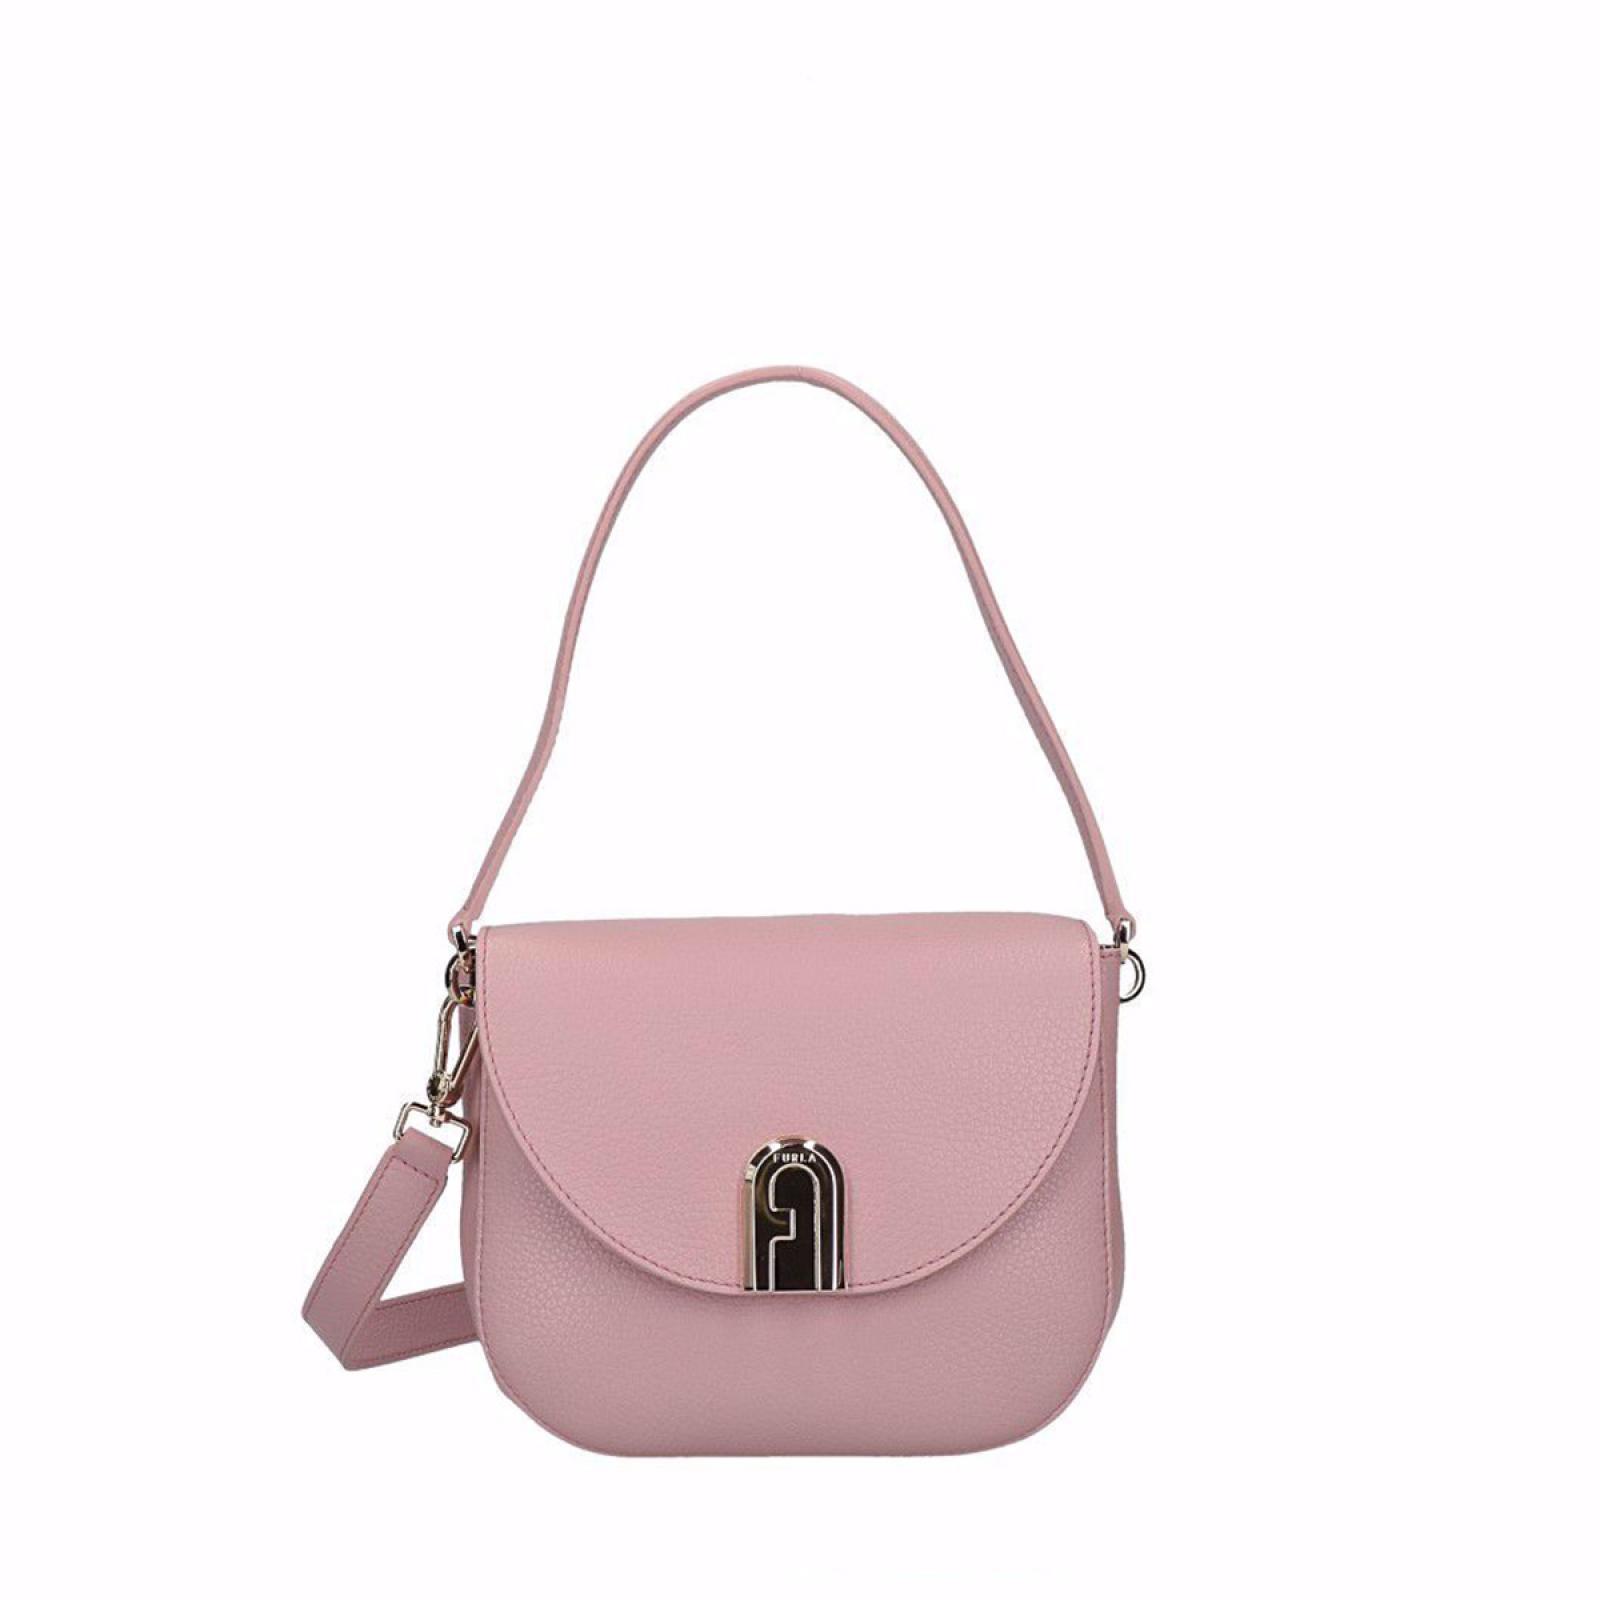 Furla Mini borsa Bandoliera Sleek 1045006 - 1